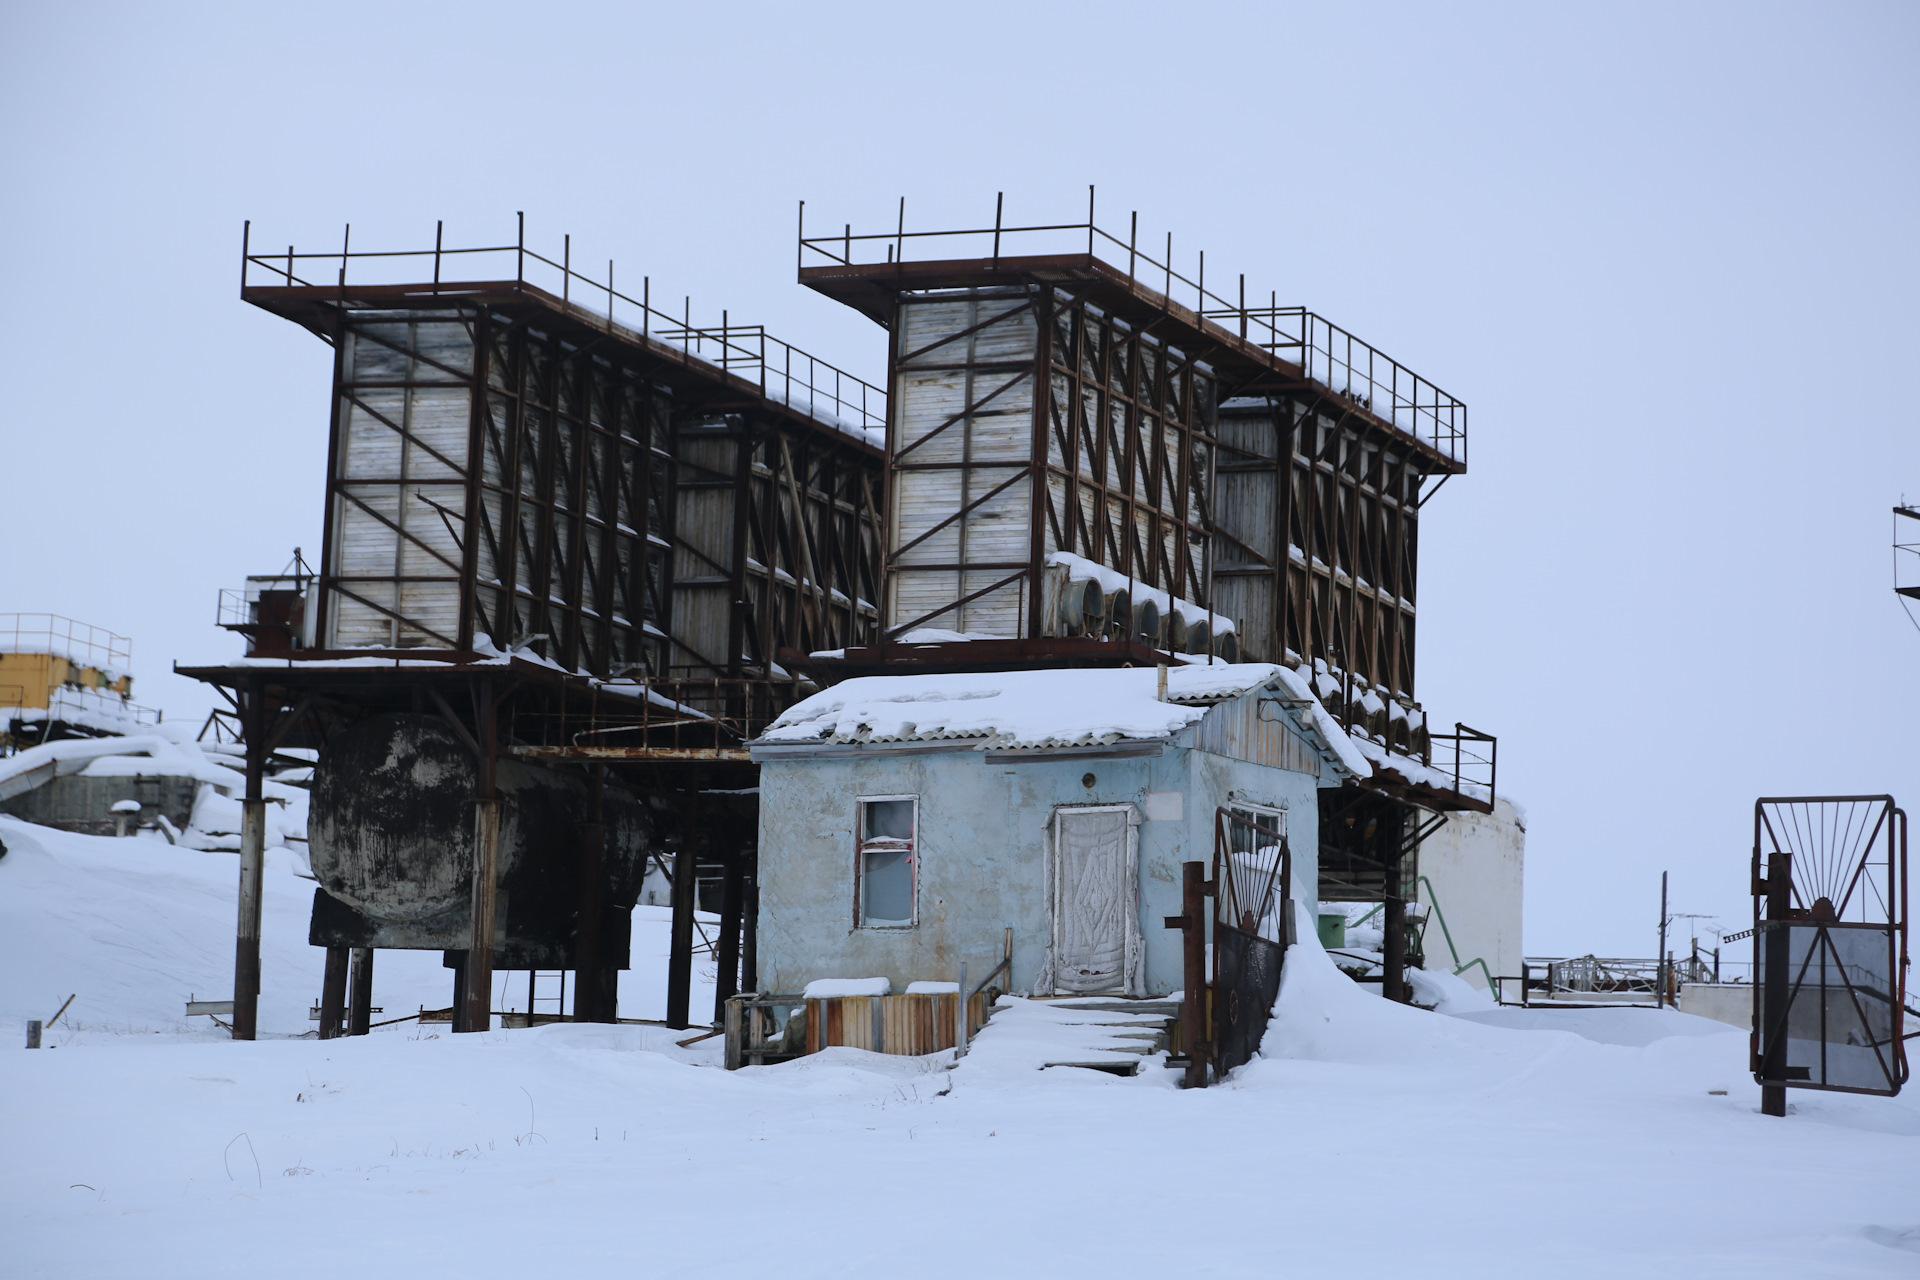 саха якутия поселок кулар ул строительная фото